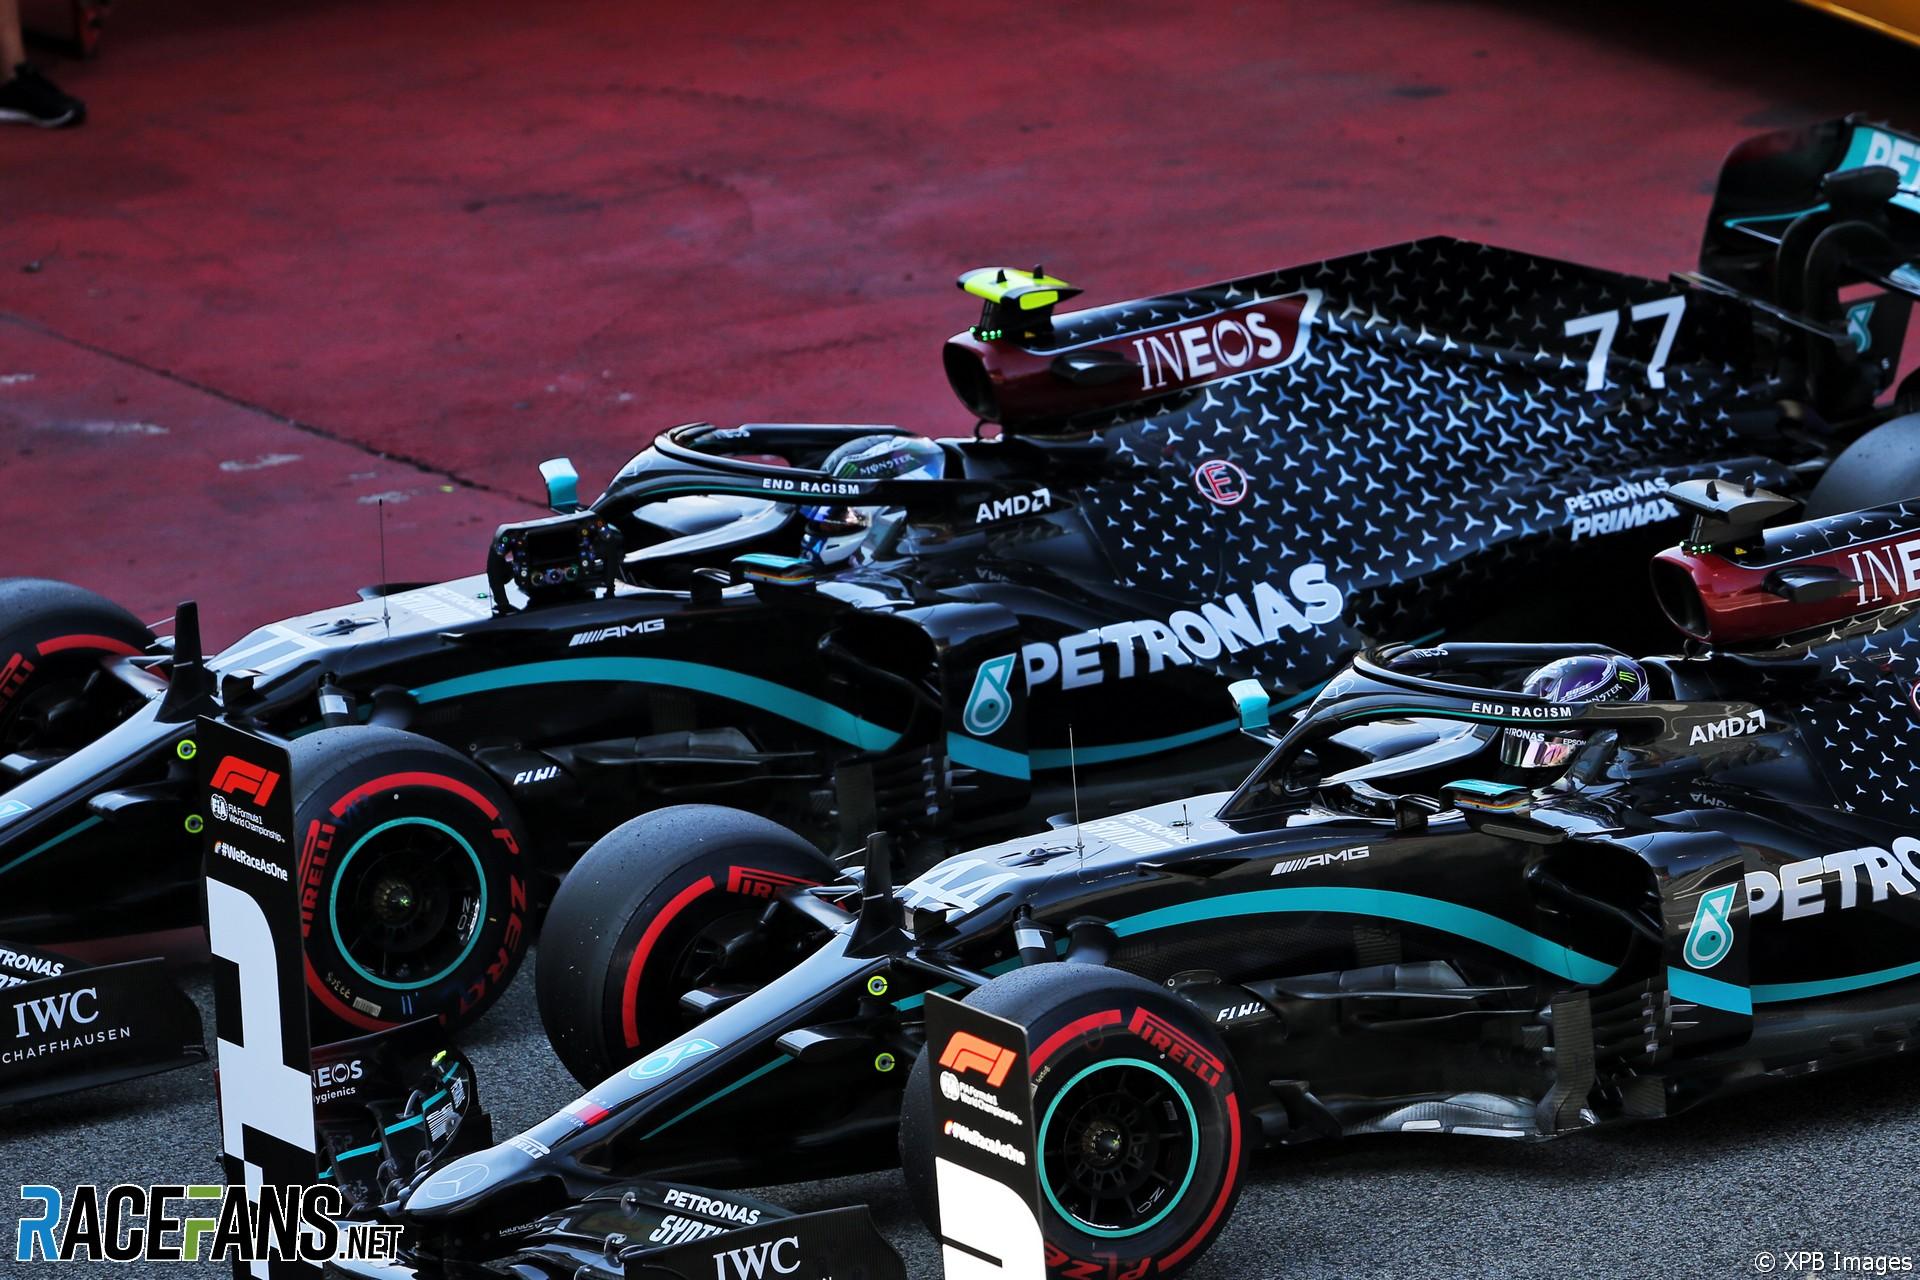 Lewis Hamilton, Valtteri Bottas, Mercedes, Circuit de Catalunya, 2020